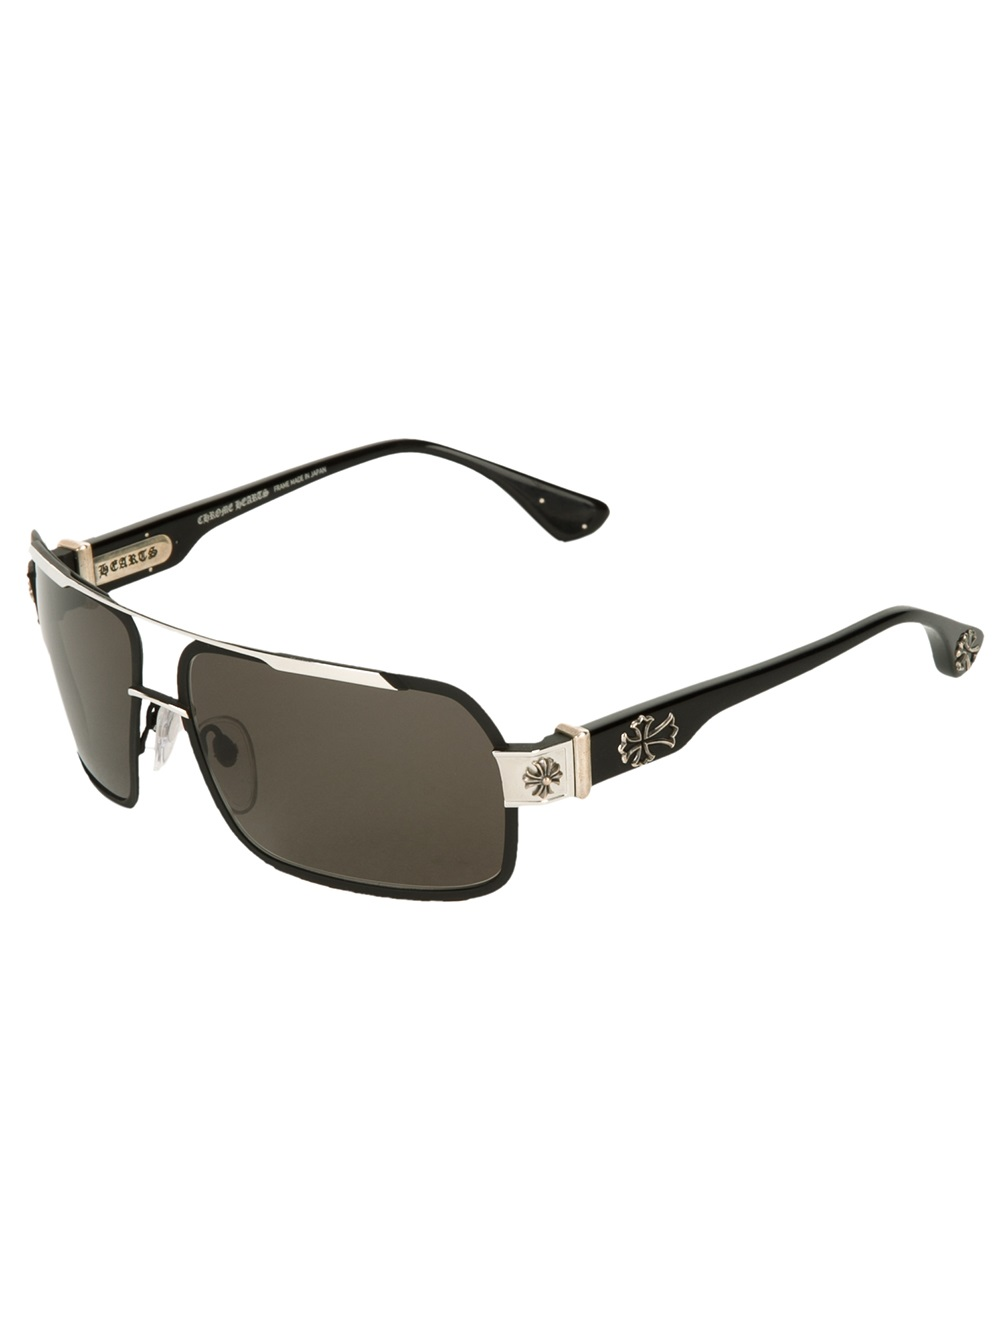 ebc9d1055e7 Chrome Hearts Sunglasses For Men